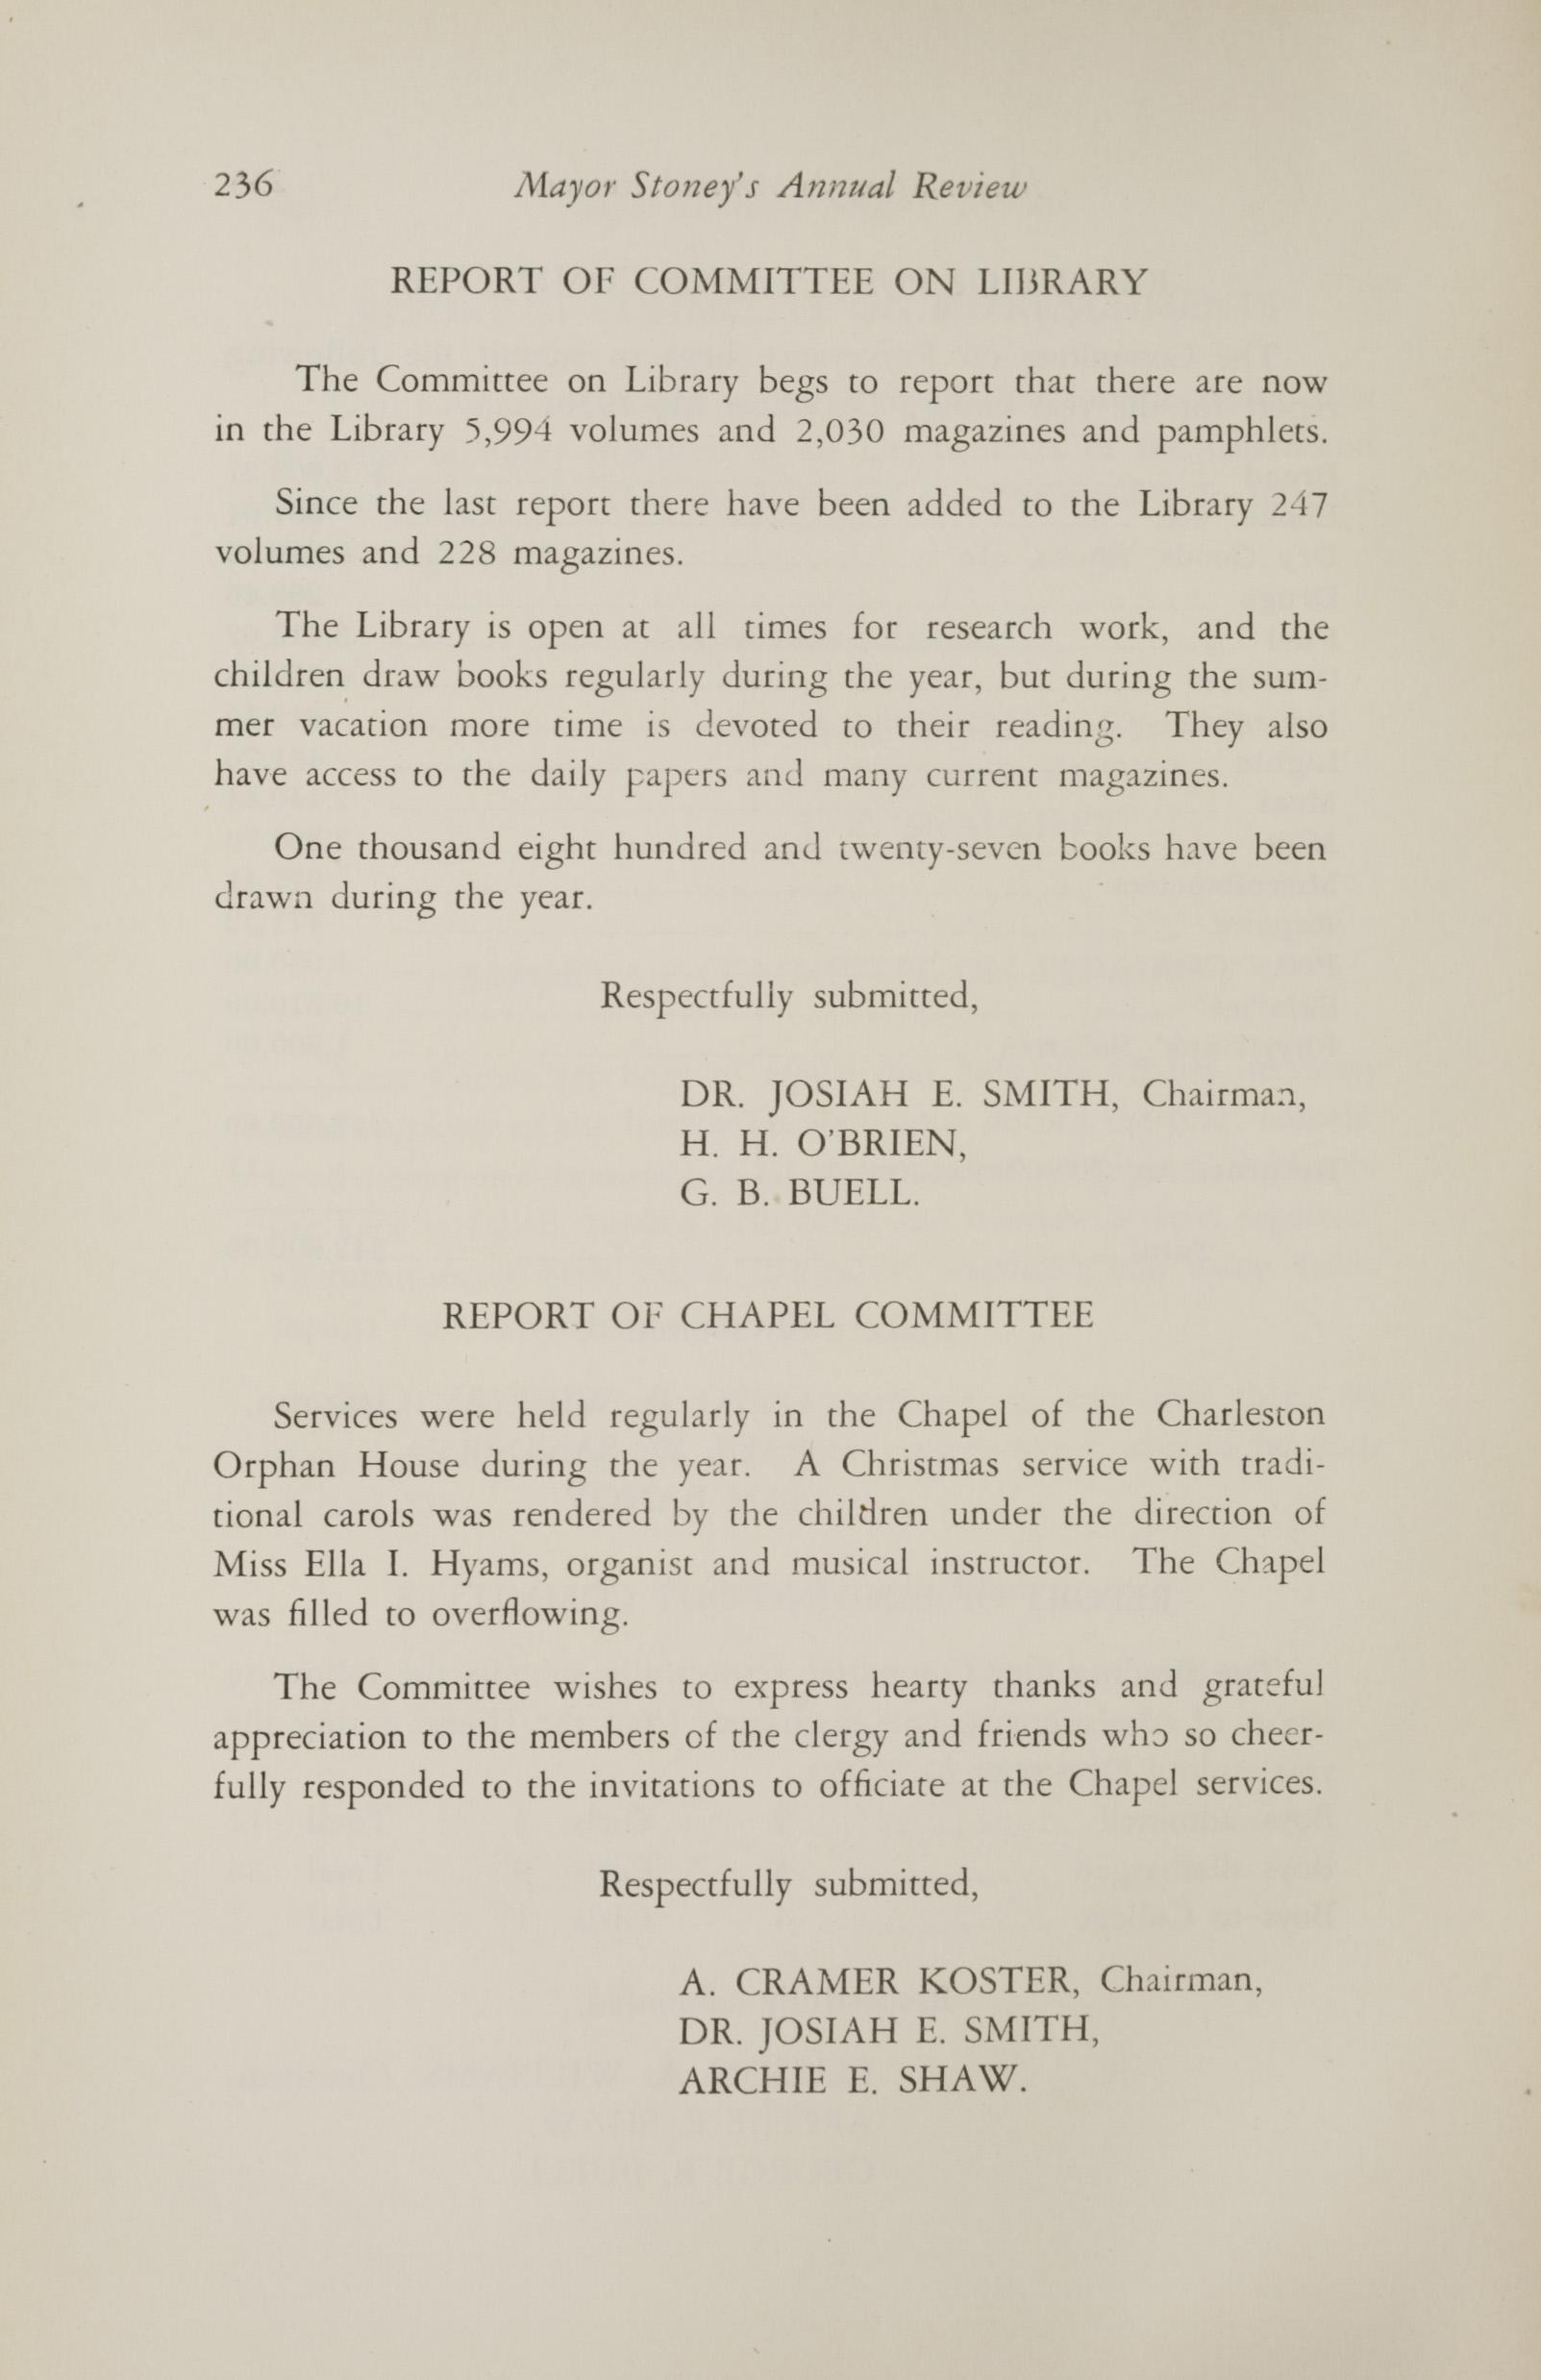 Charleston Yearbook, 1930, page 236